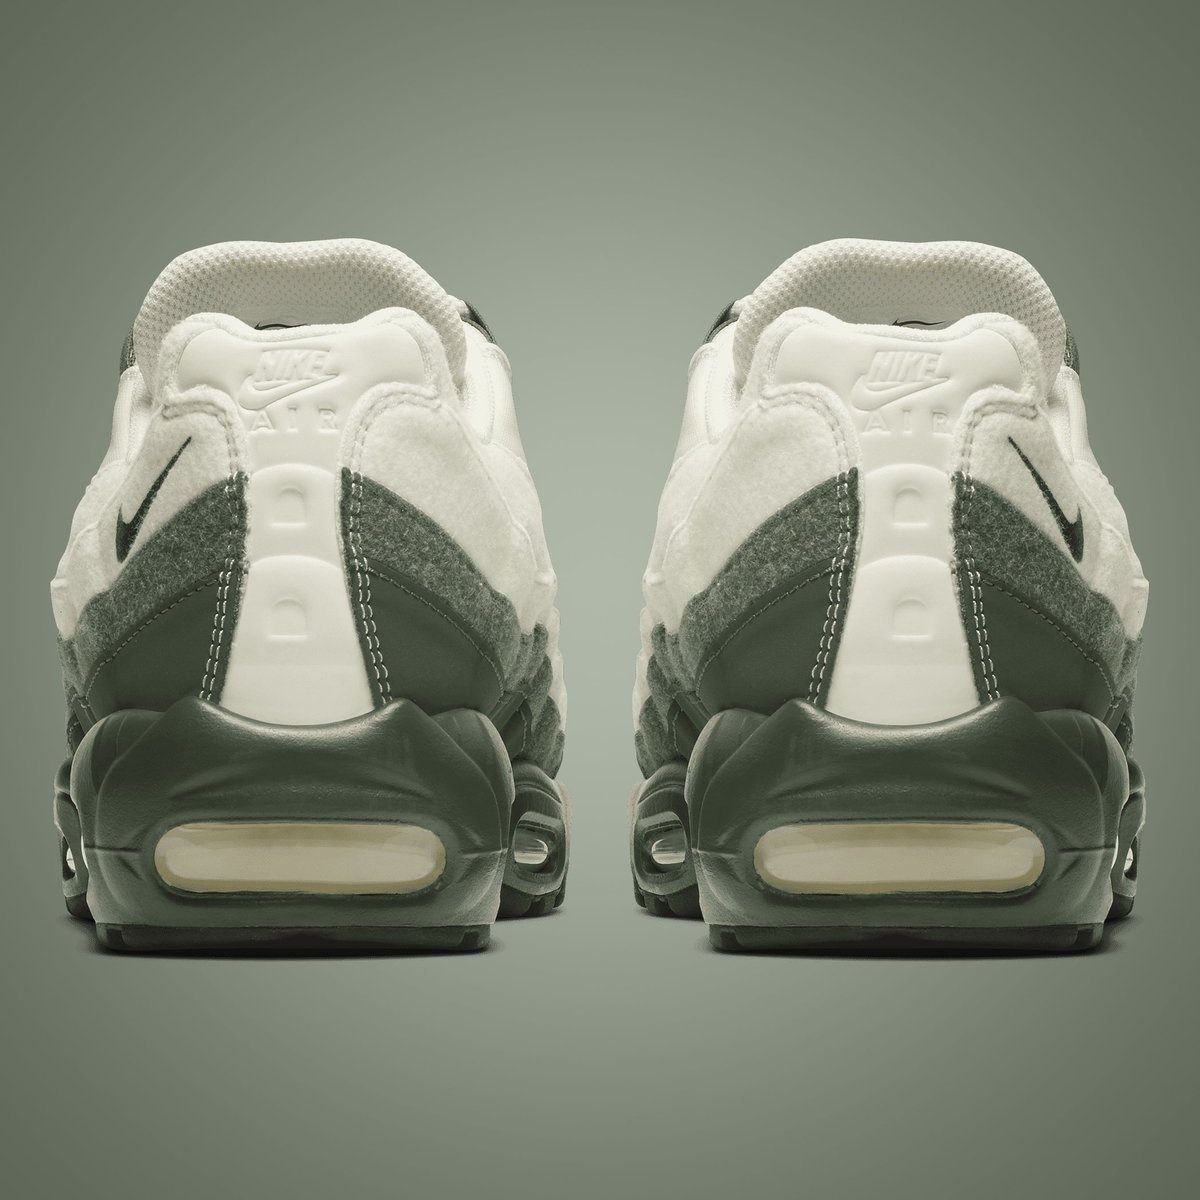 3e94beb0f Nike Air Max 95